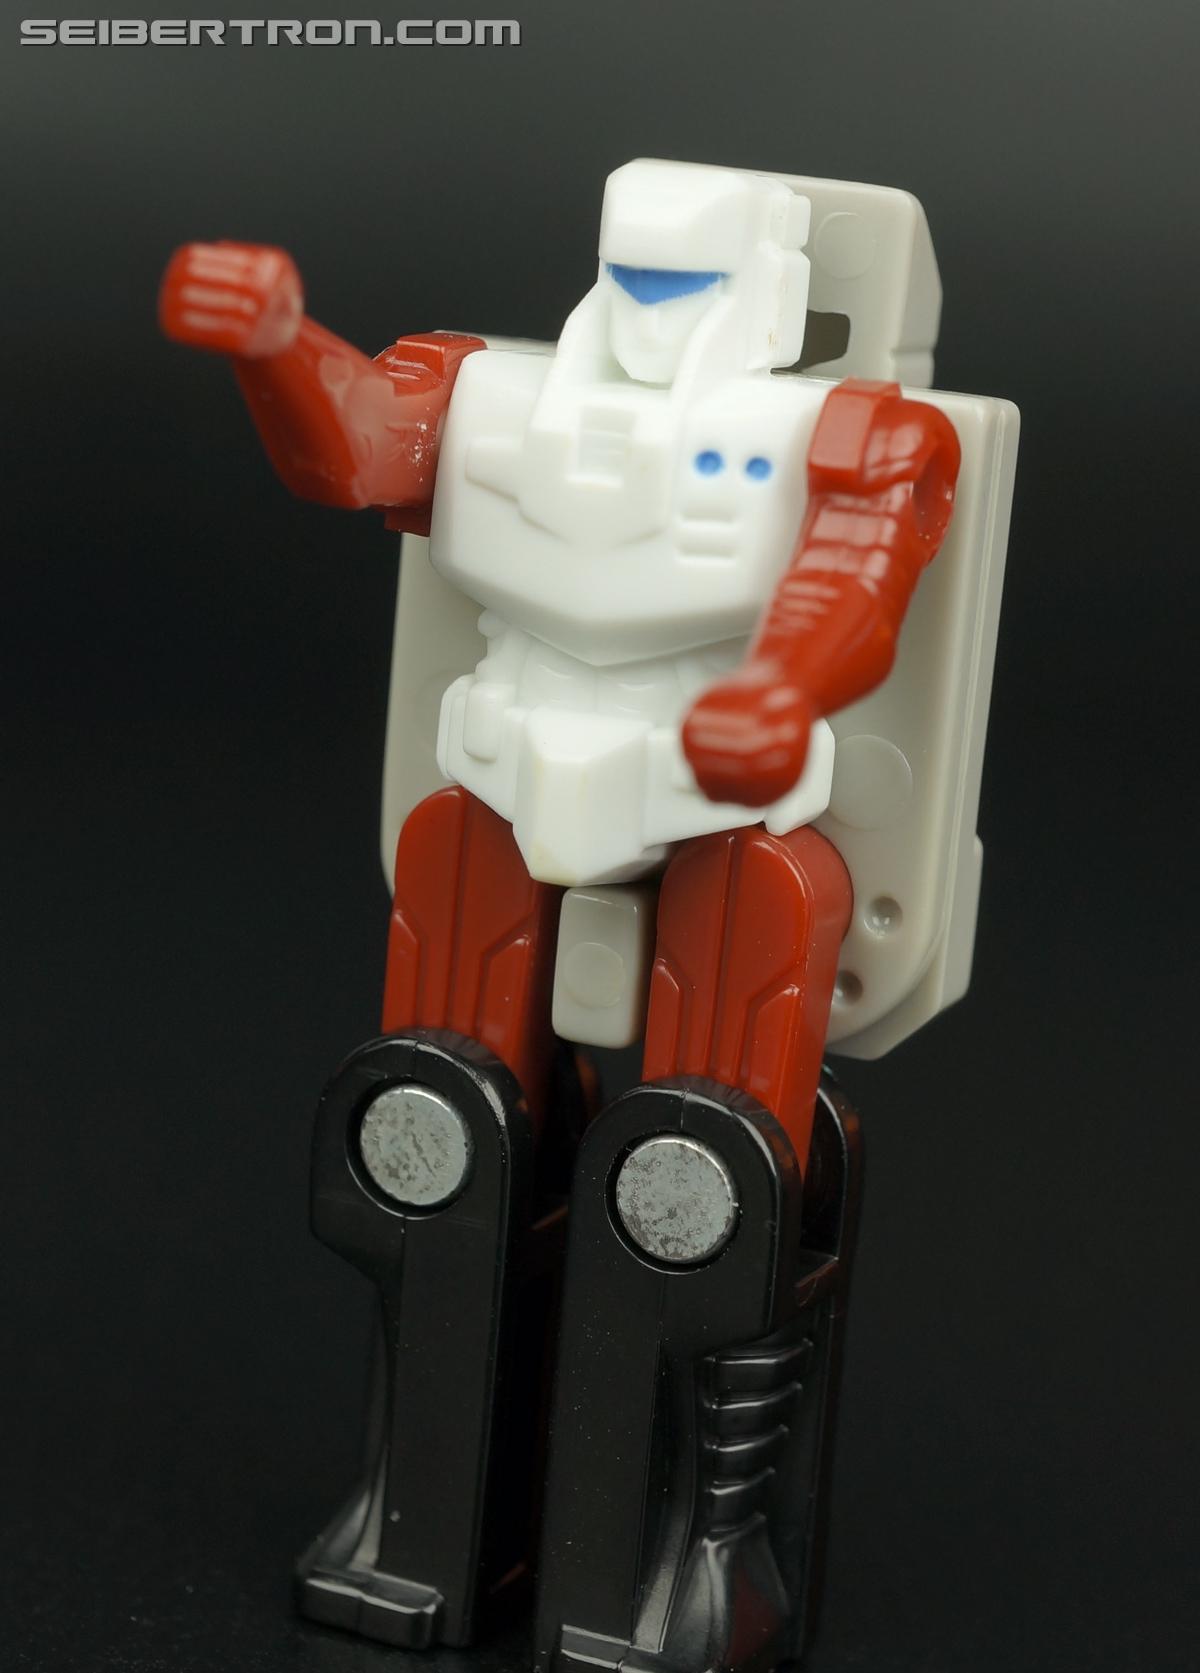 Transformers G1 1988 Hi-Q (Ginrai) (Image #60 of 76)